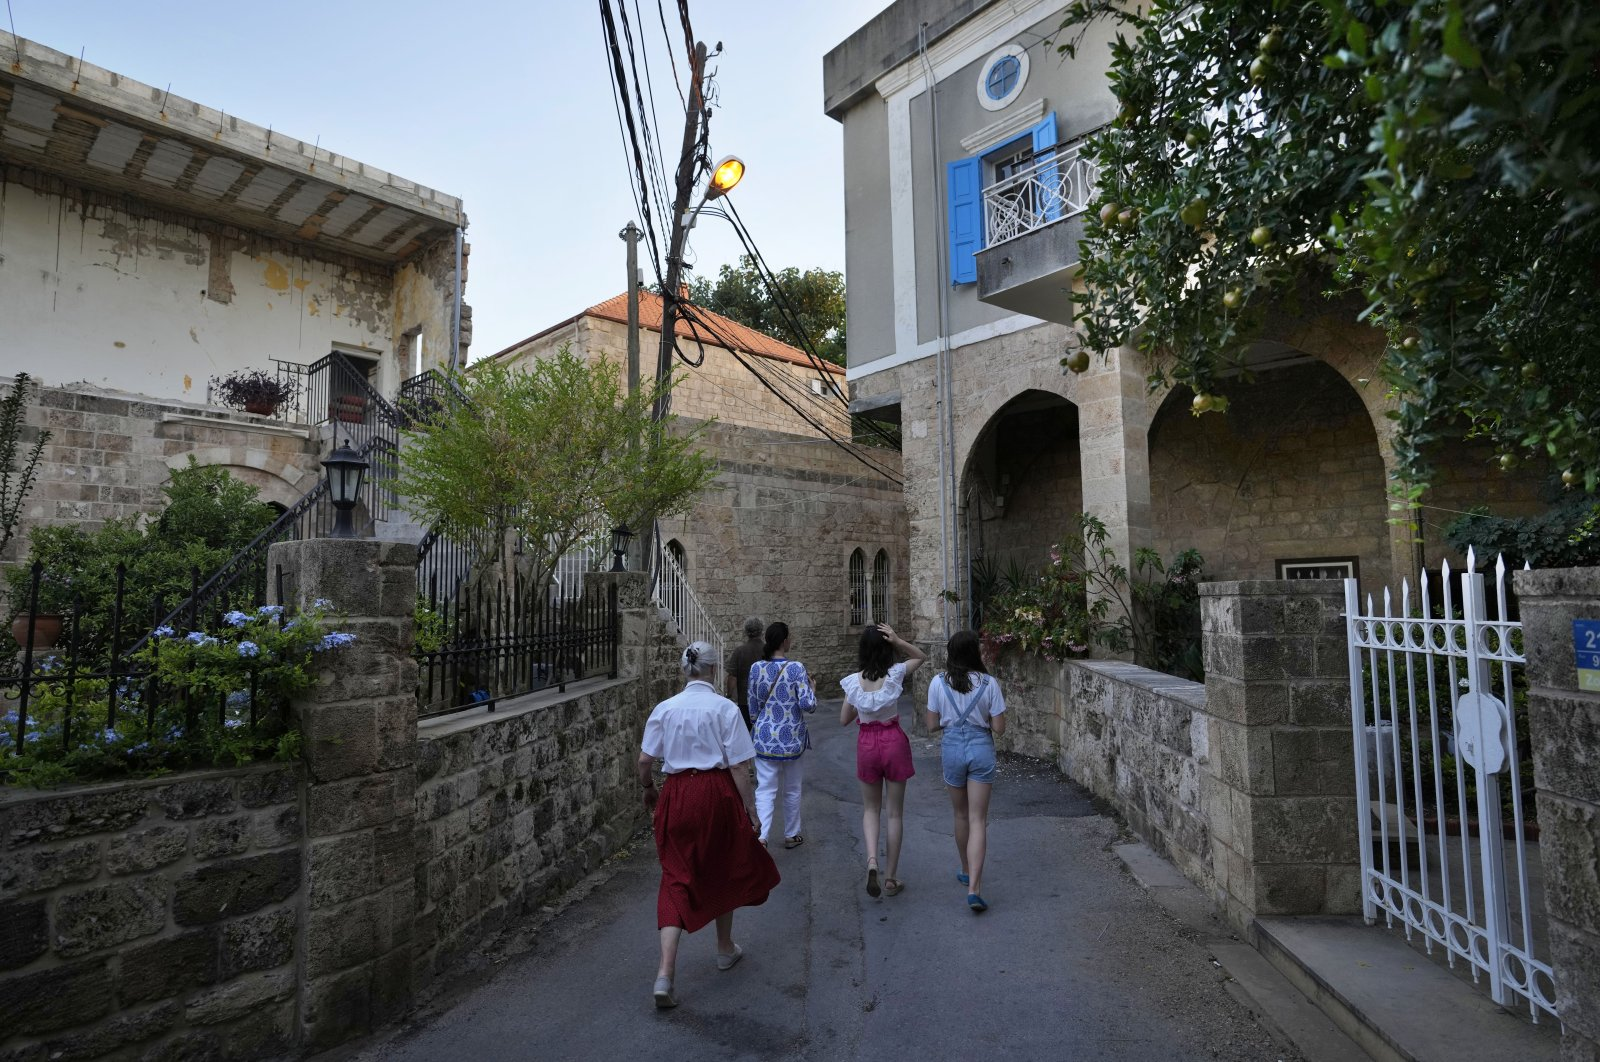 Tourists visit Batroun village, north of Beirut, Lebanon, Friday, July 2, 2021. (AP Photo)